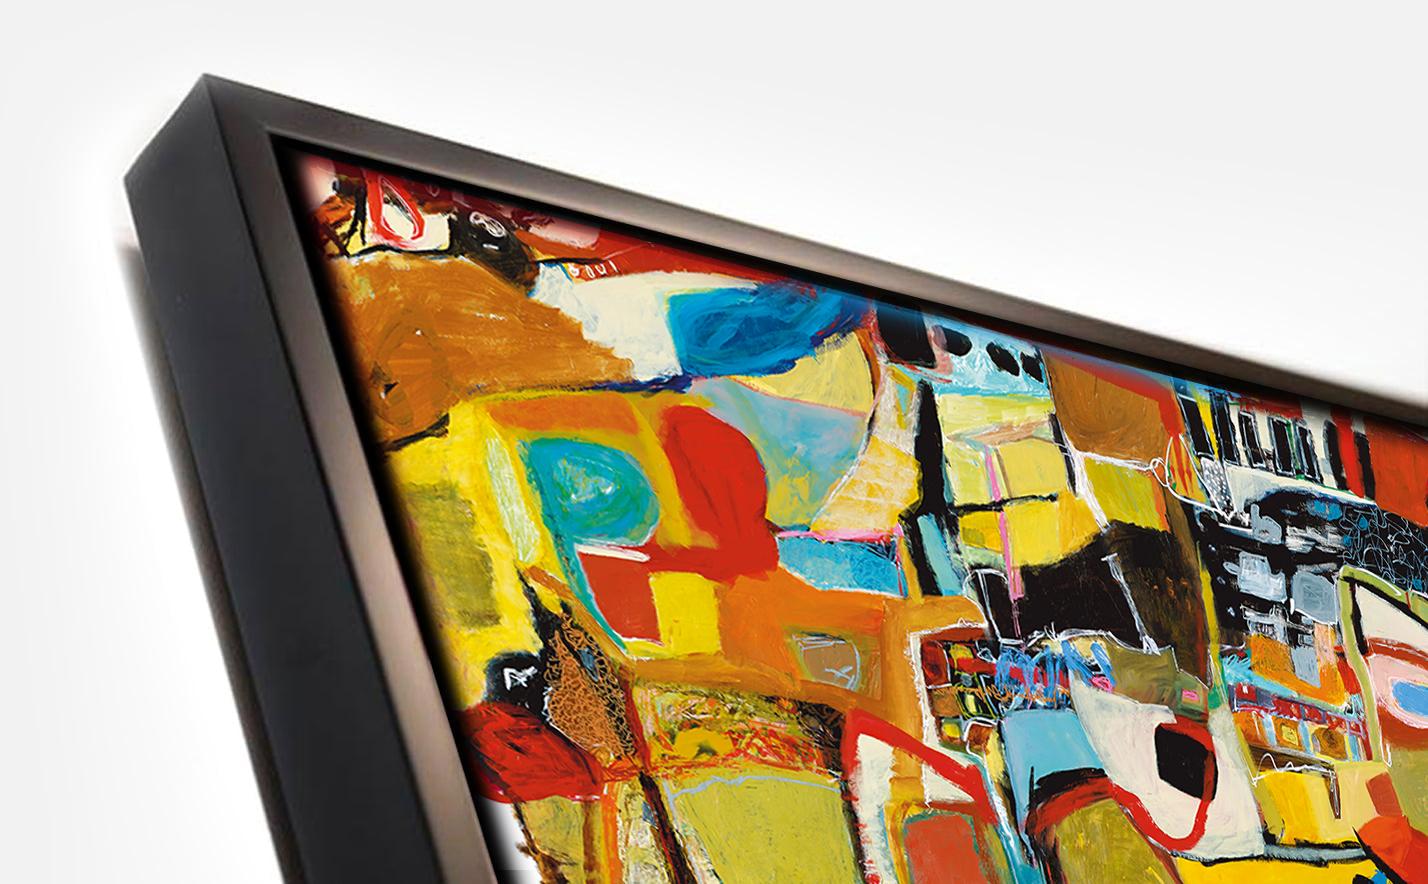 framed canvas for sale demo, contemporary art, art prints, home decor